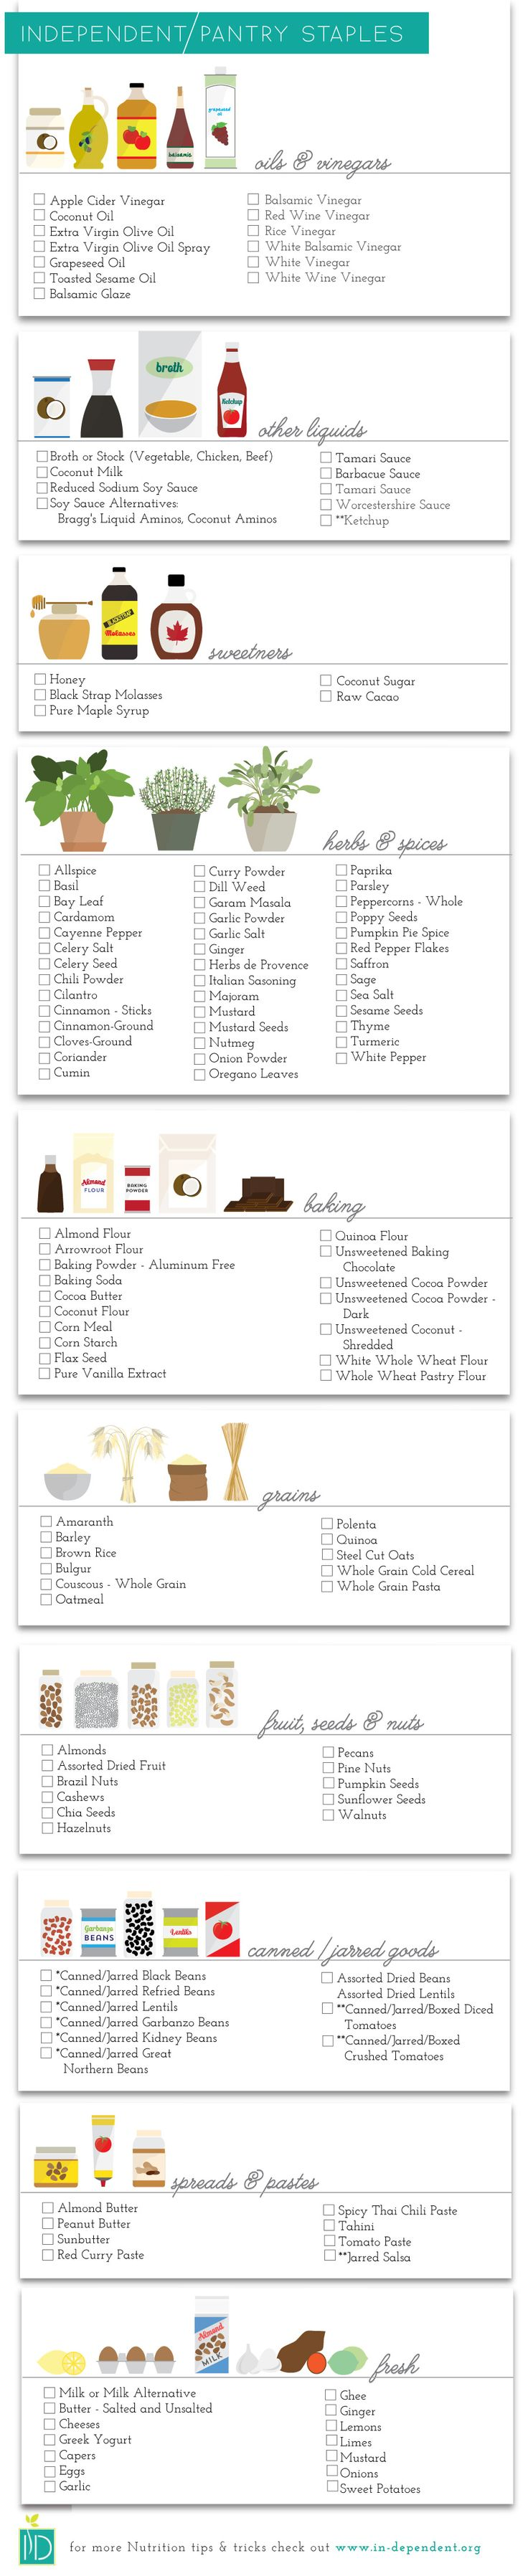 Healthy Pantry Essentials  |  InDependent